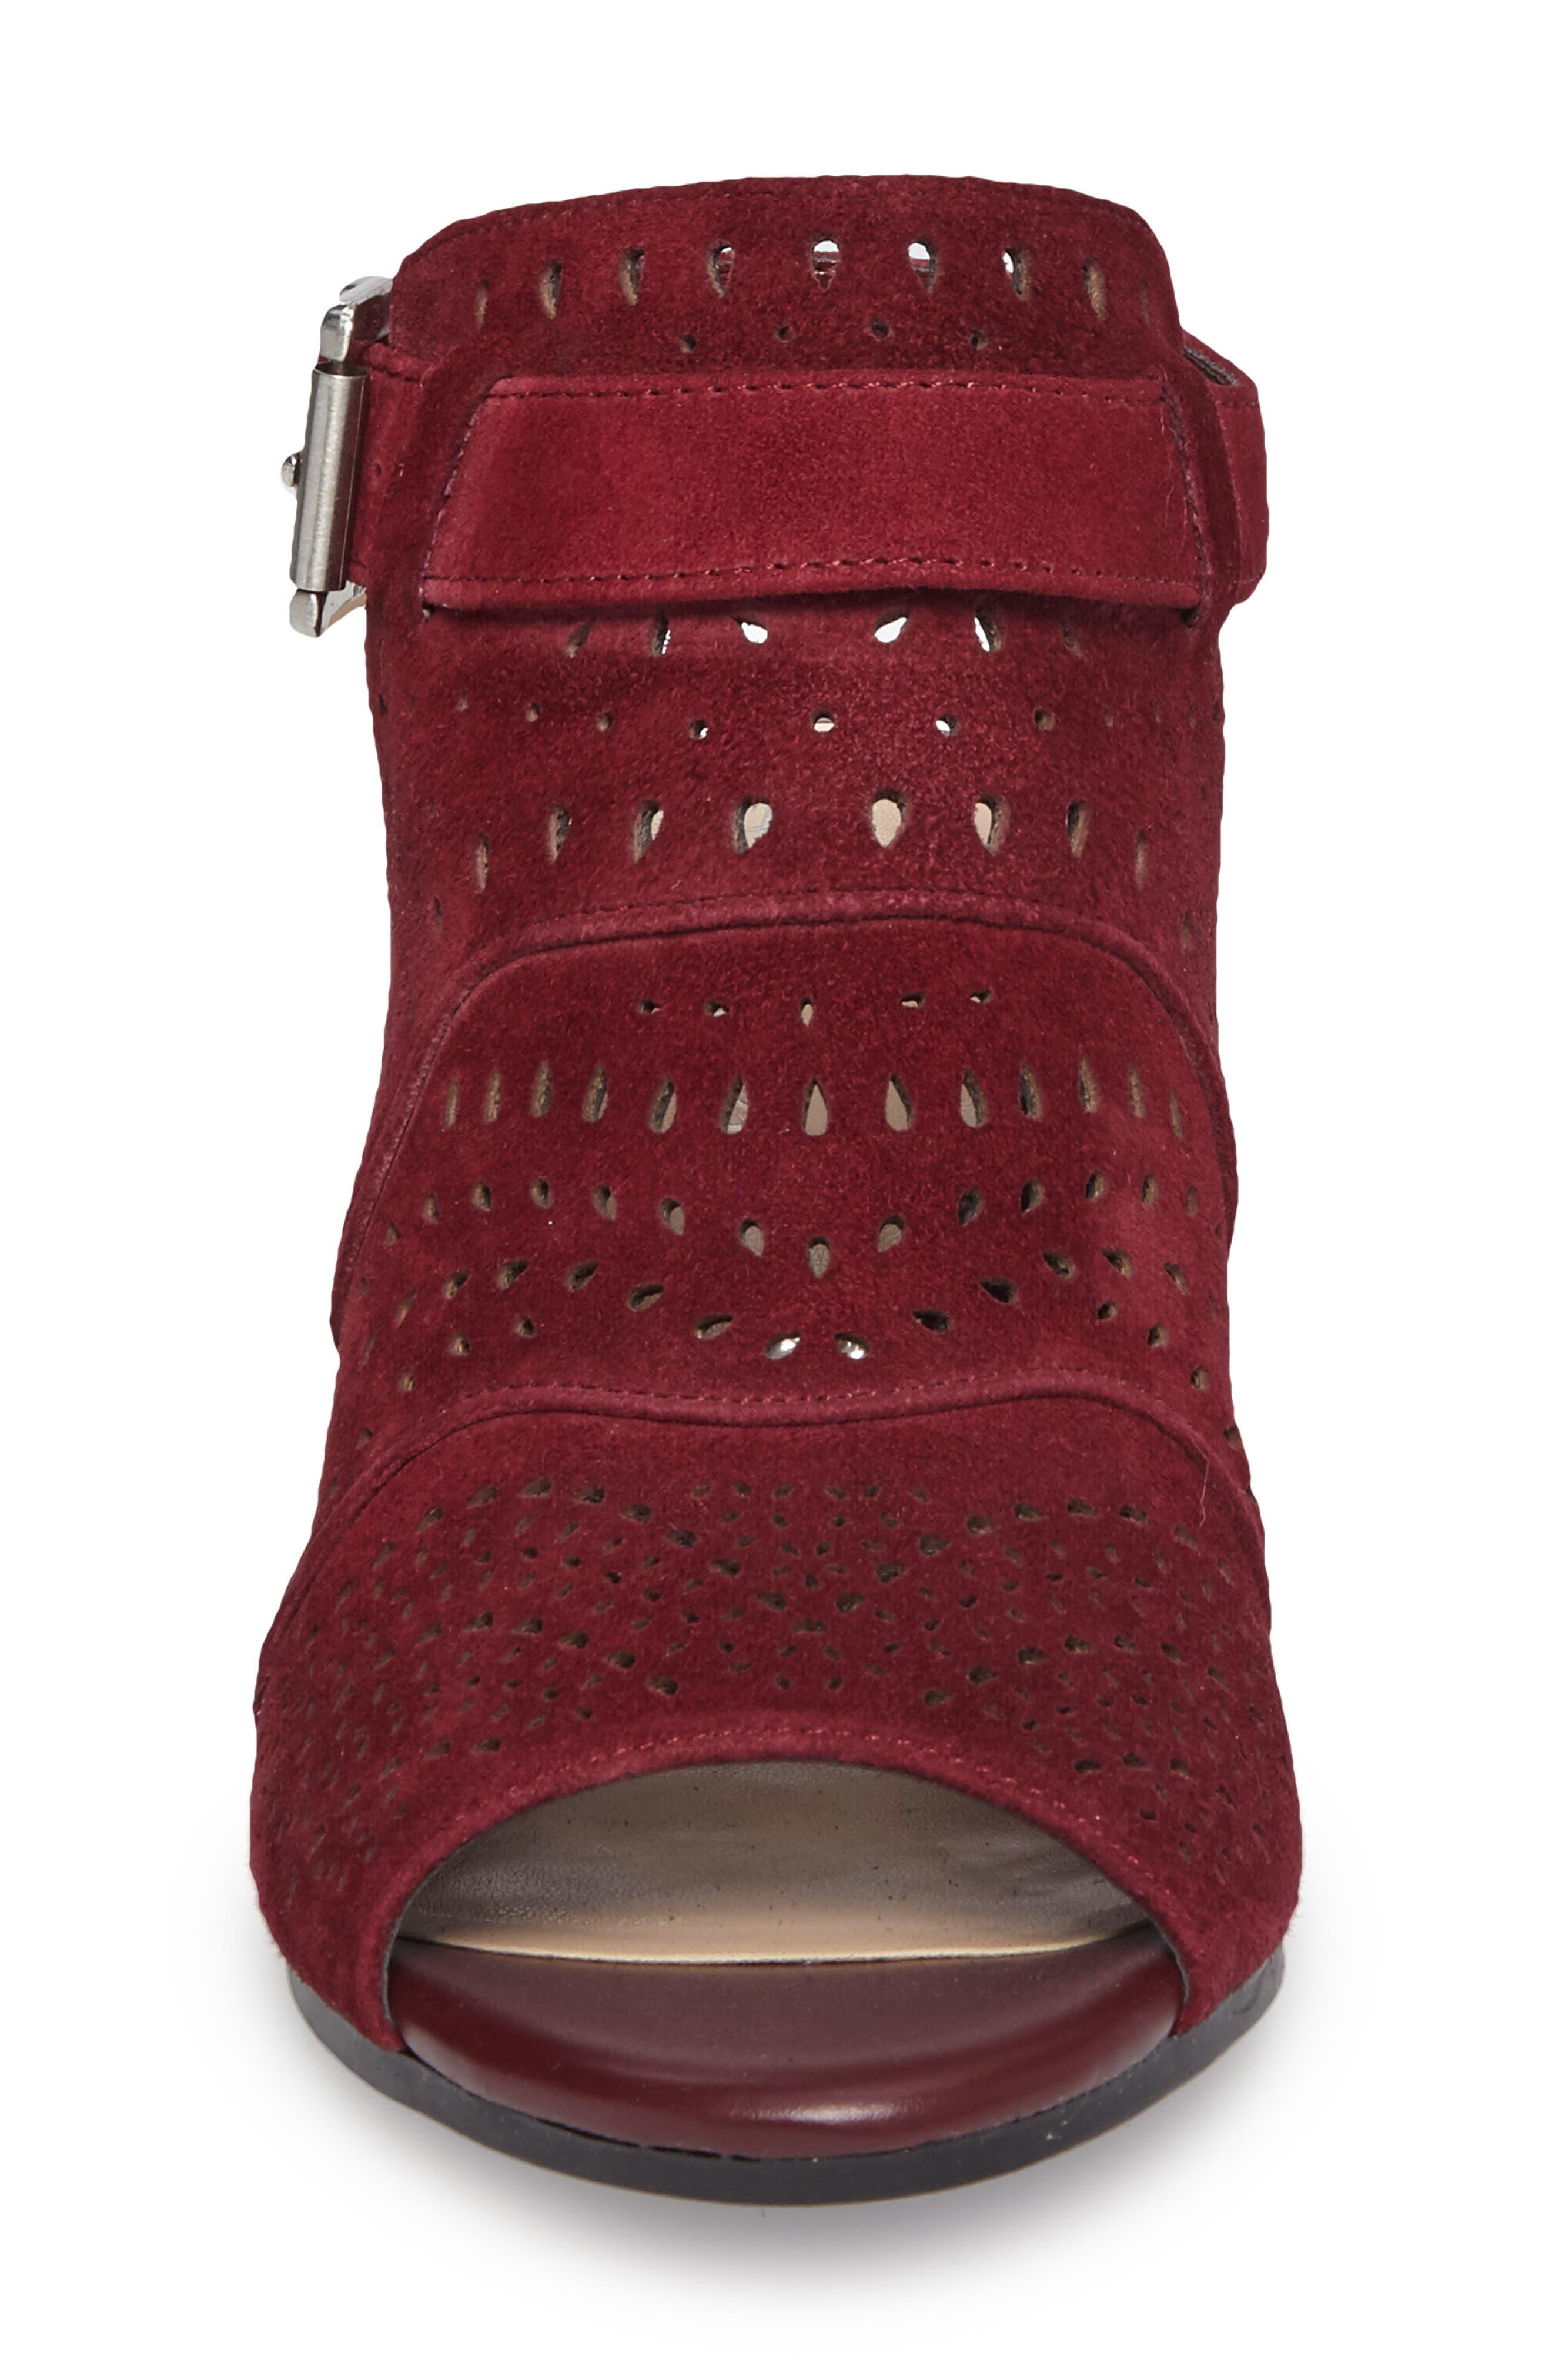 Fonda Perforated Sandal,                             Alternate thumbnail 4, color,                             930